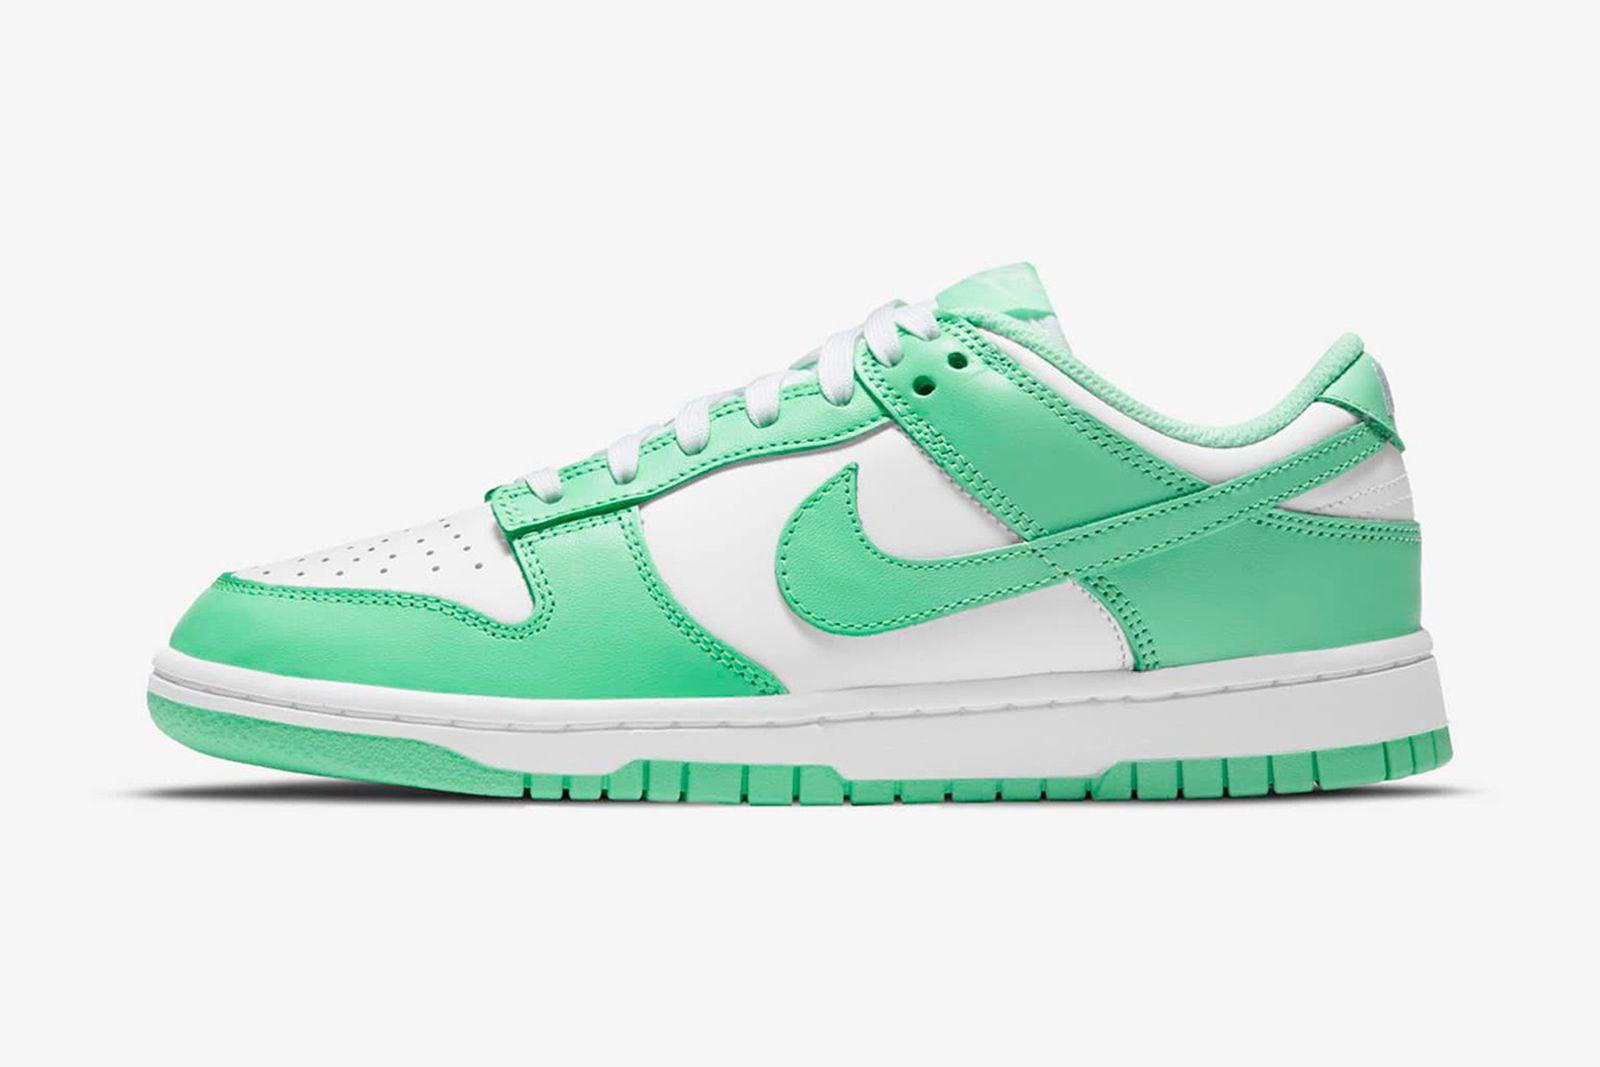 nike-dunk-low-green-glow-release-date-price-02